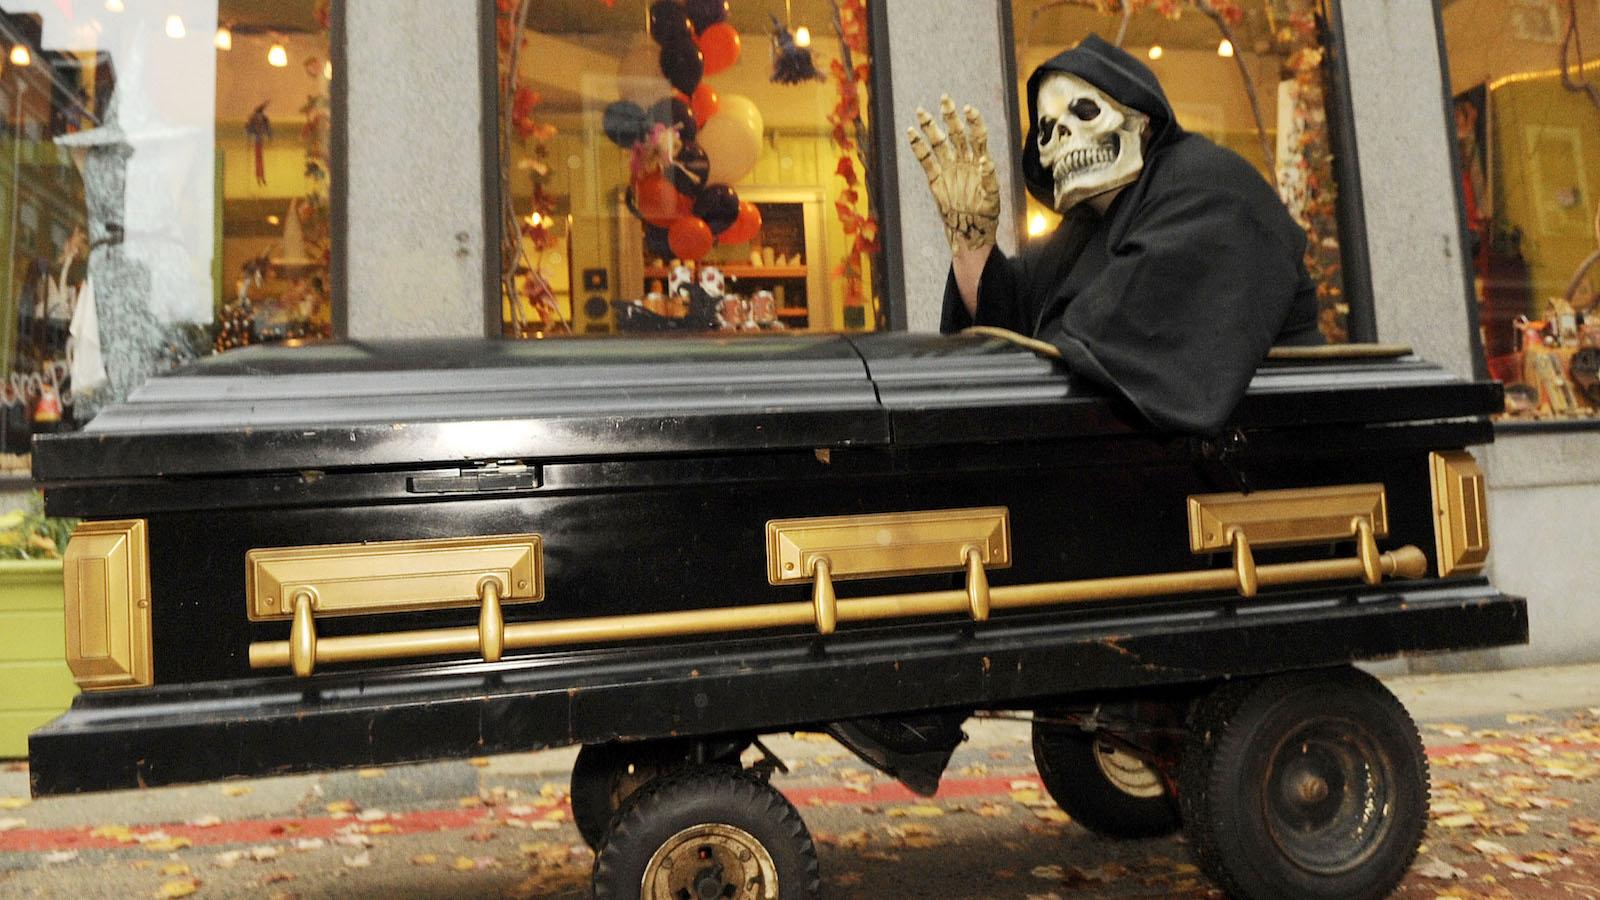 Похороны приколы картинки